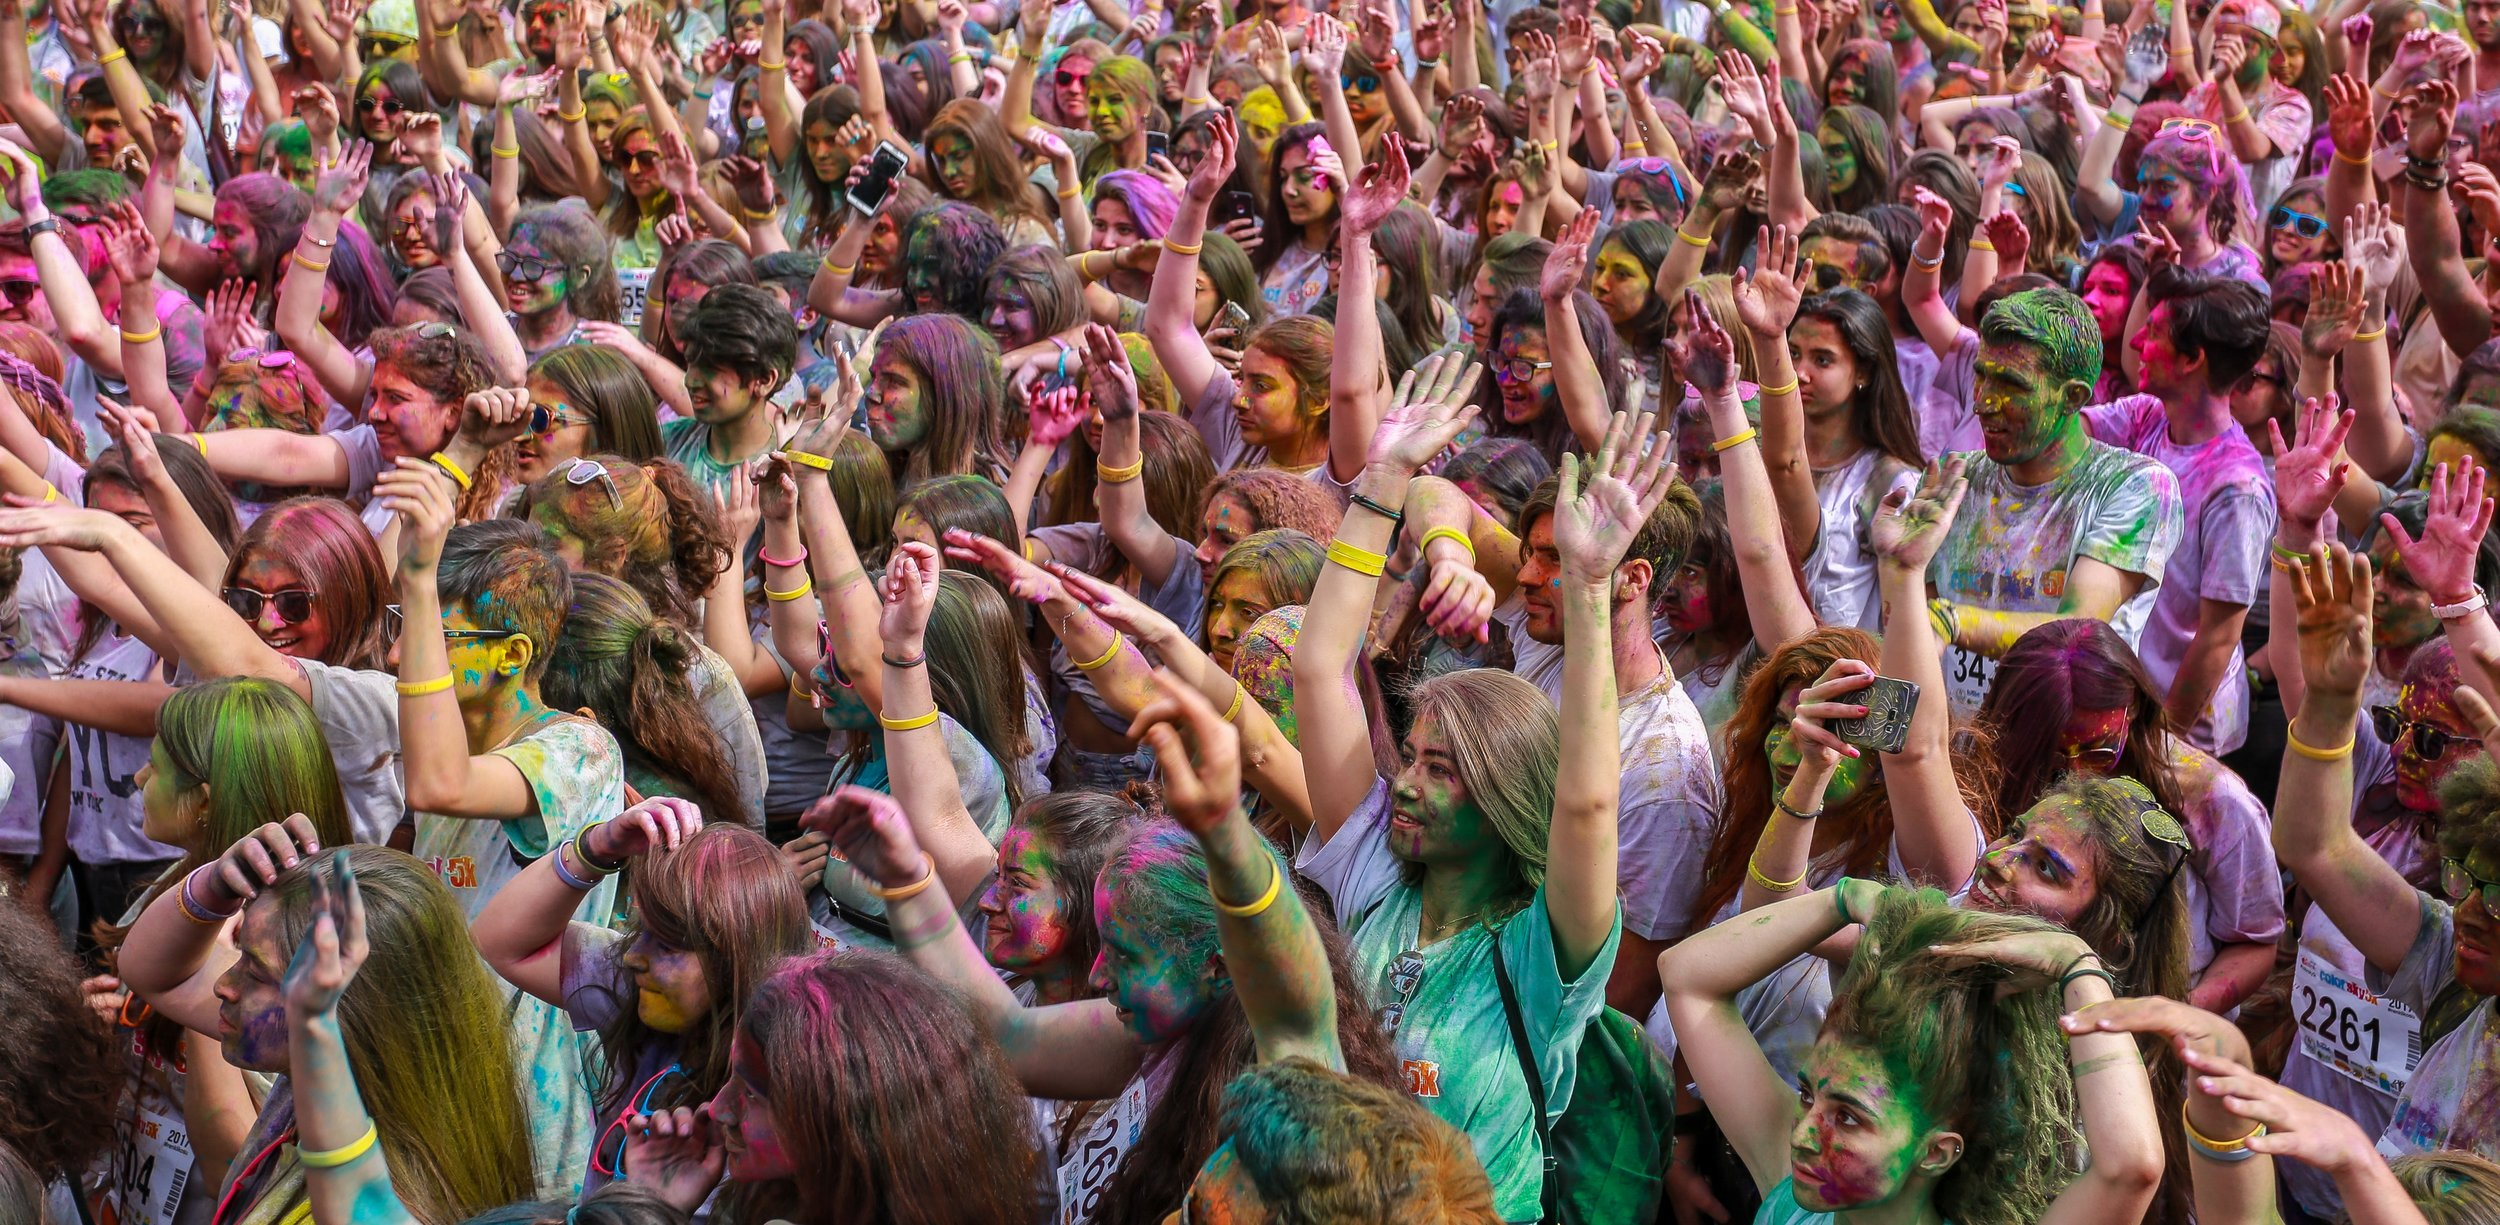 celebration-crowd-event-2283996.jpg